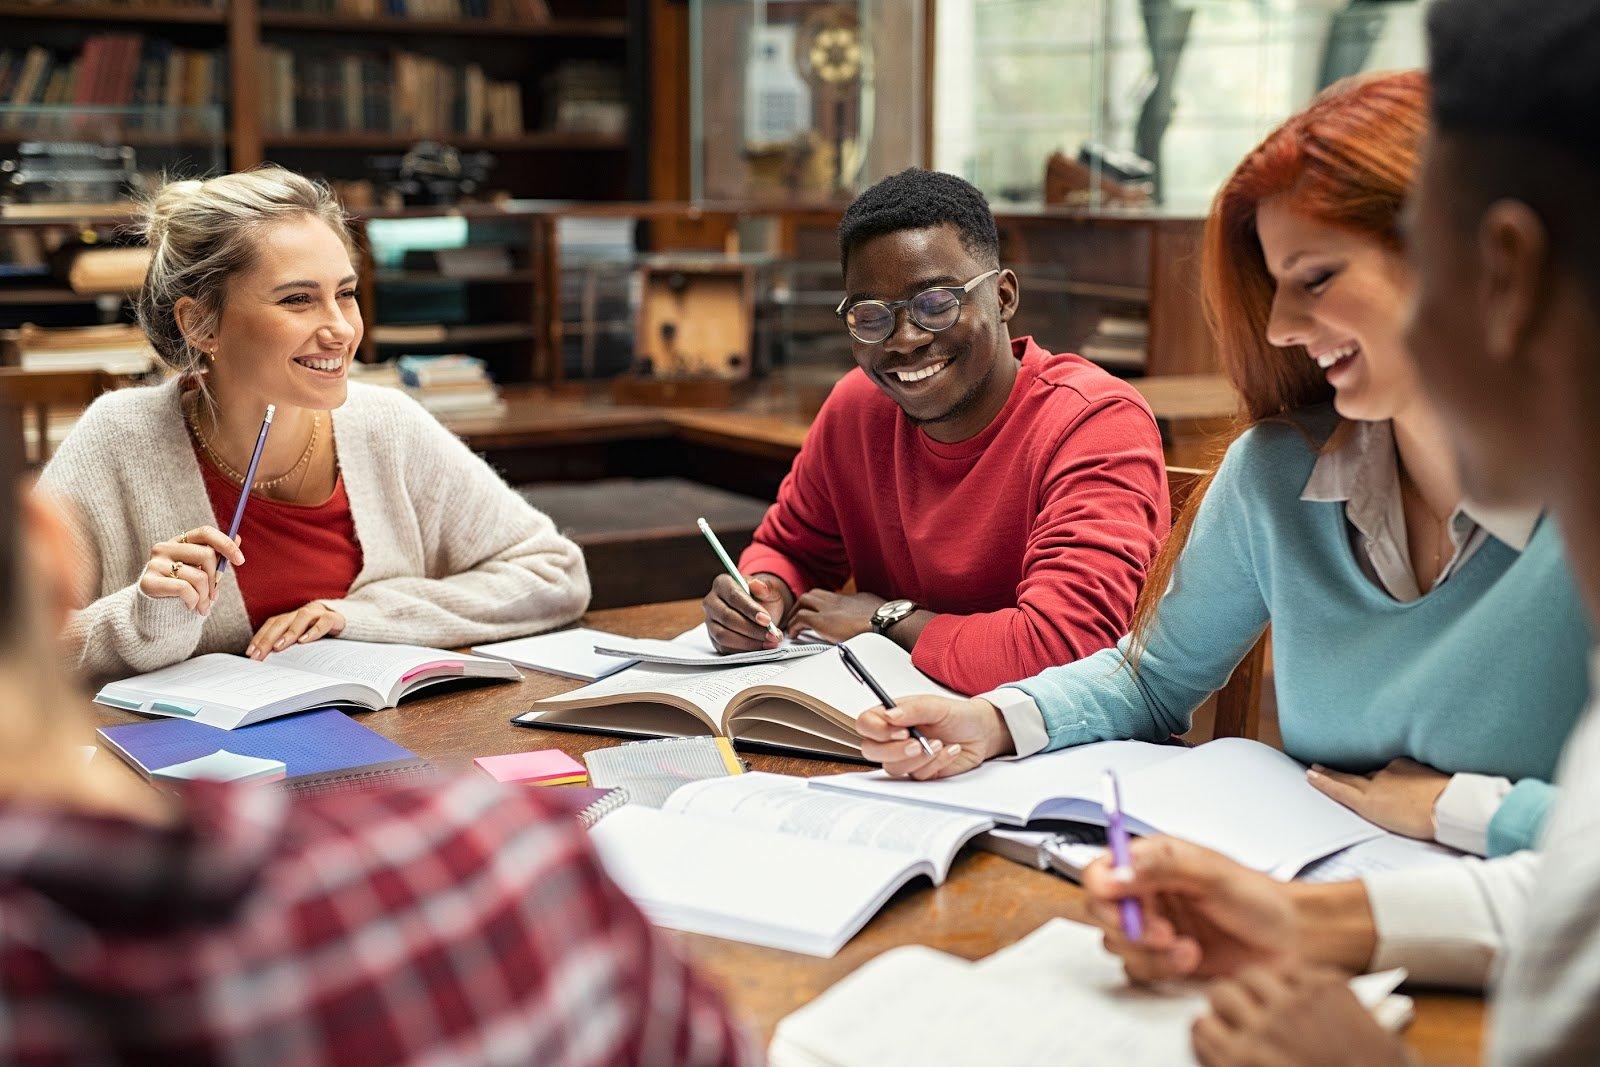 bigstock-Happy-college-students-studyin-365289763